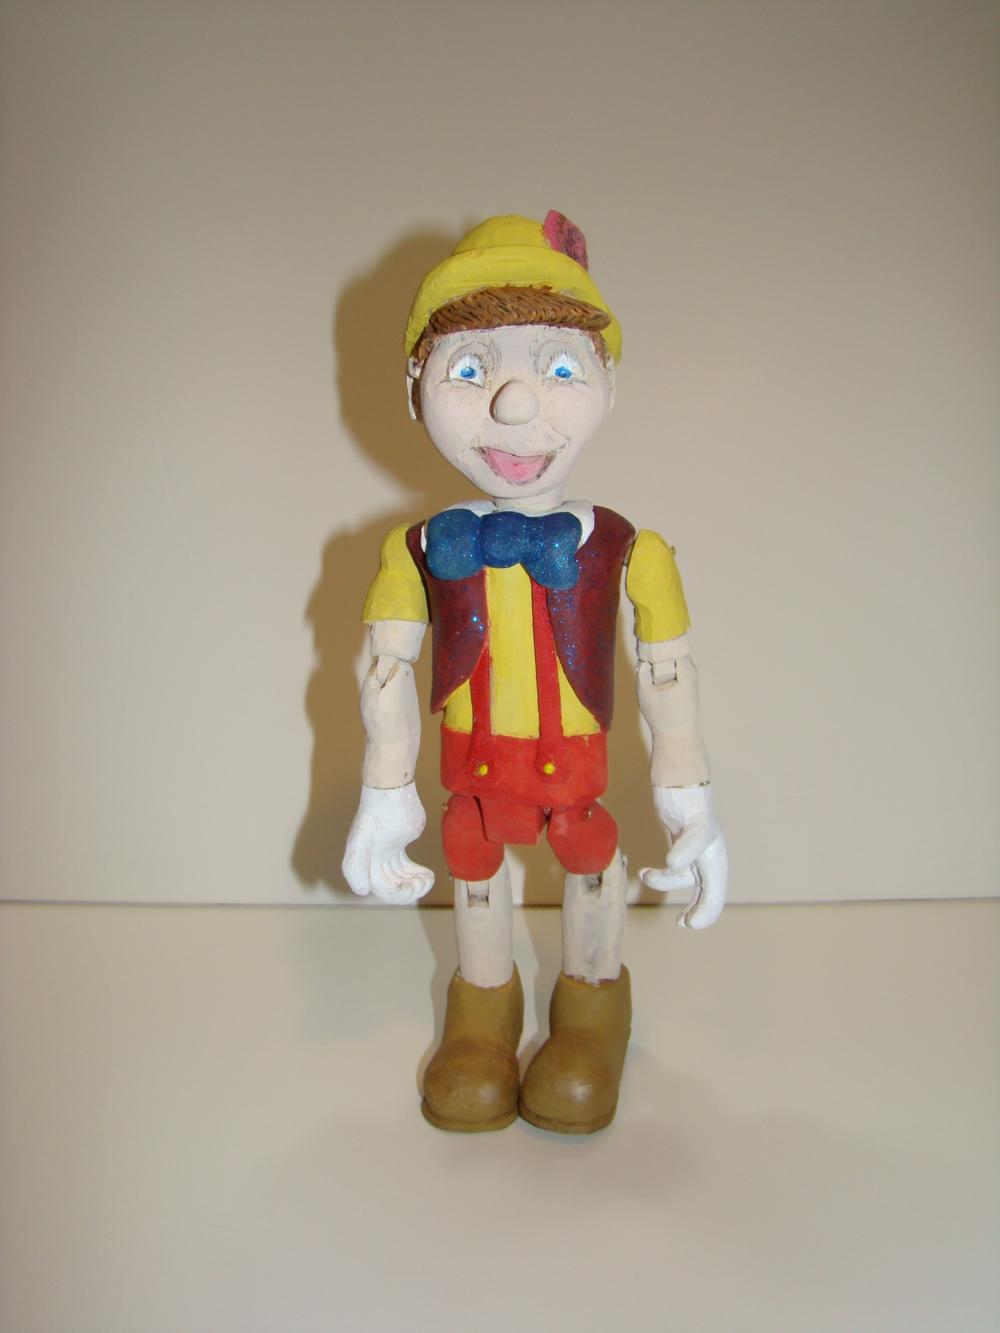 Pinocchio by Ken Maitland